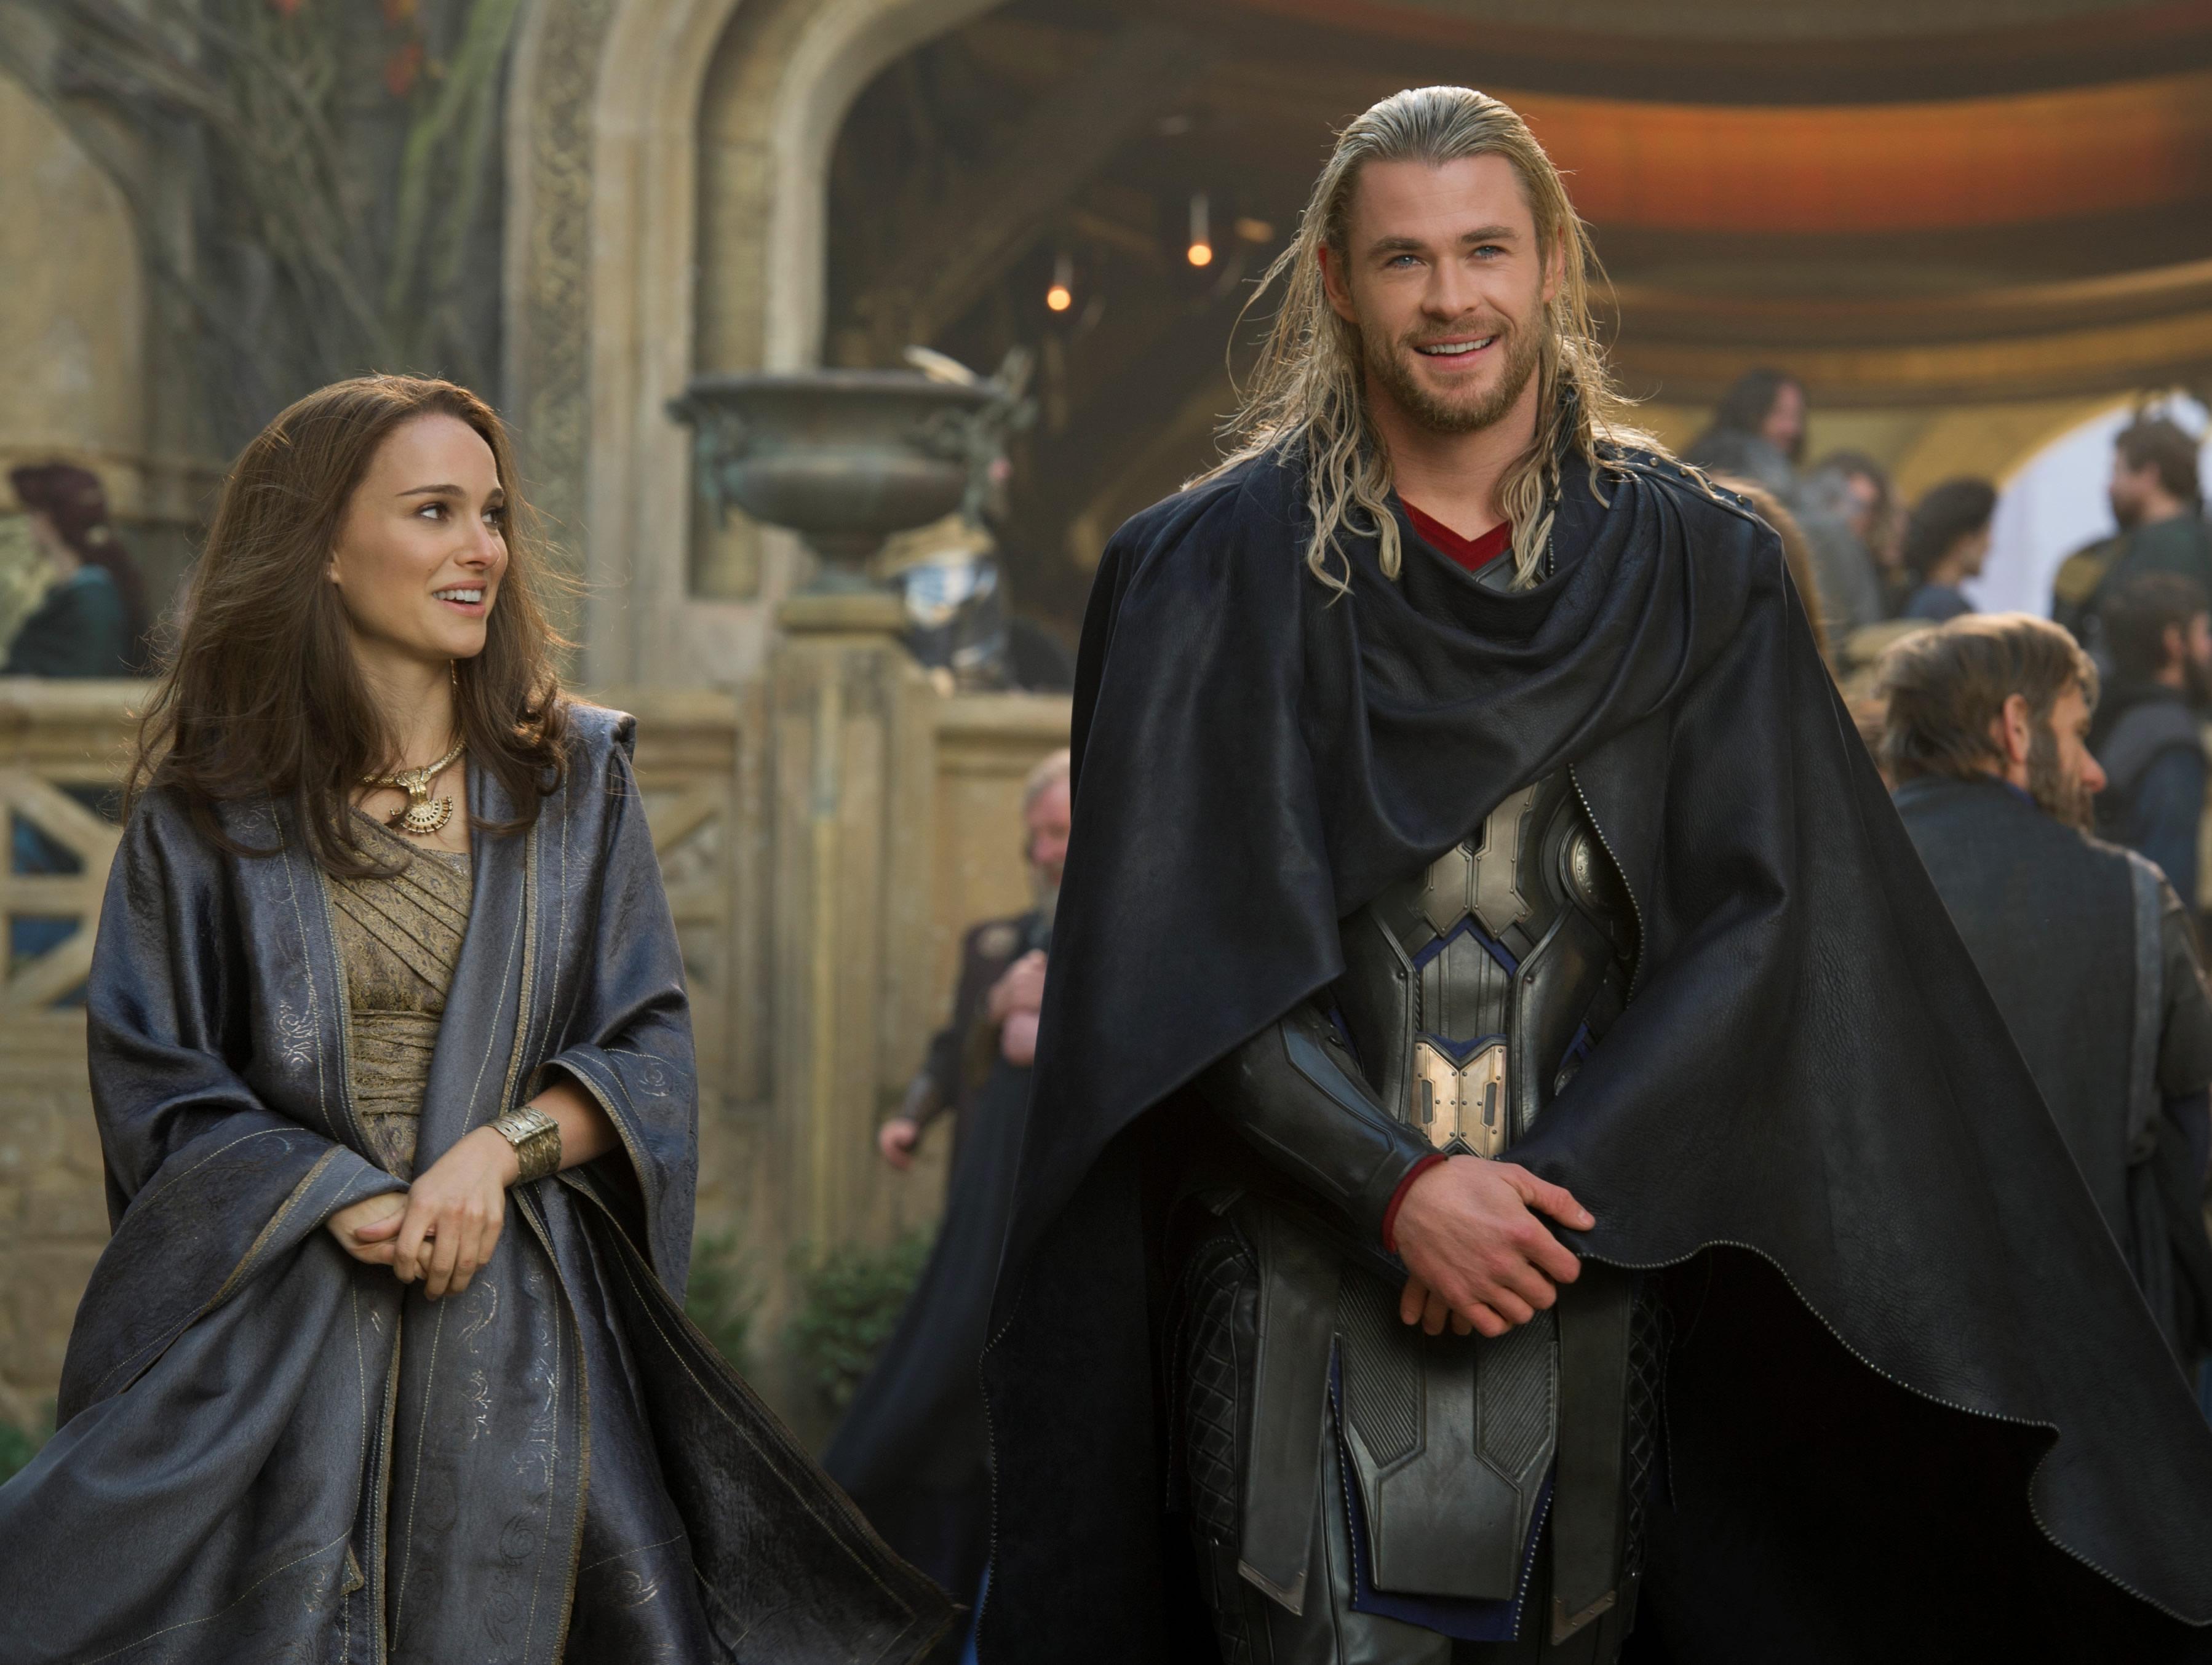 Thor-2-22abr2013-01